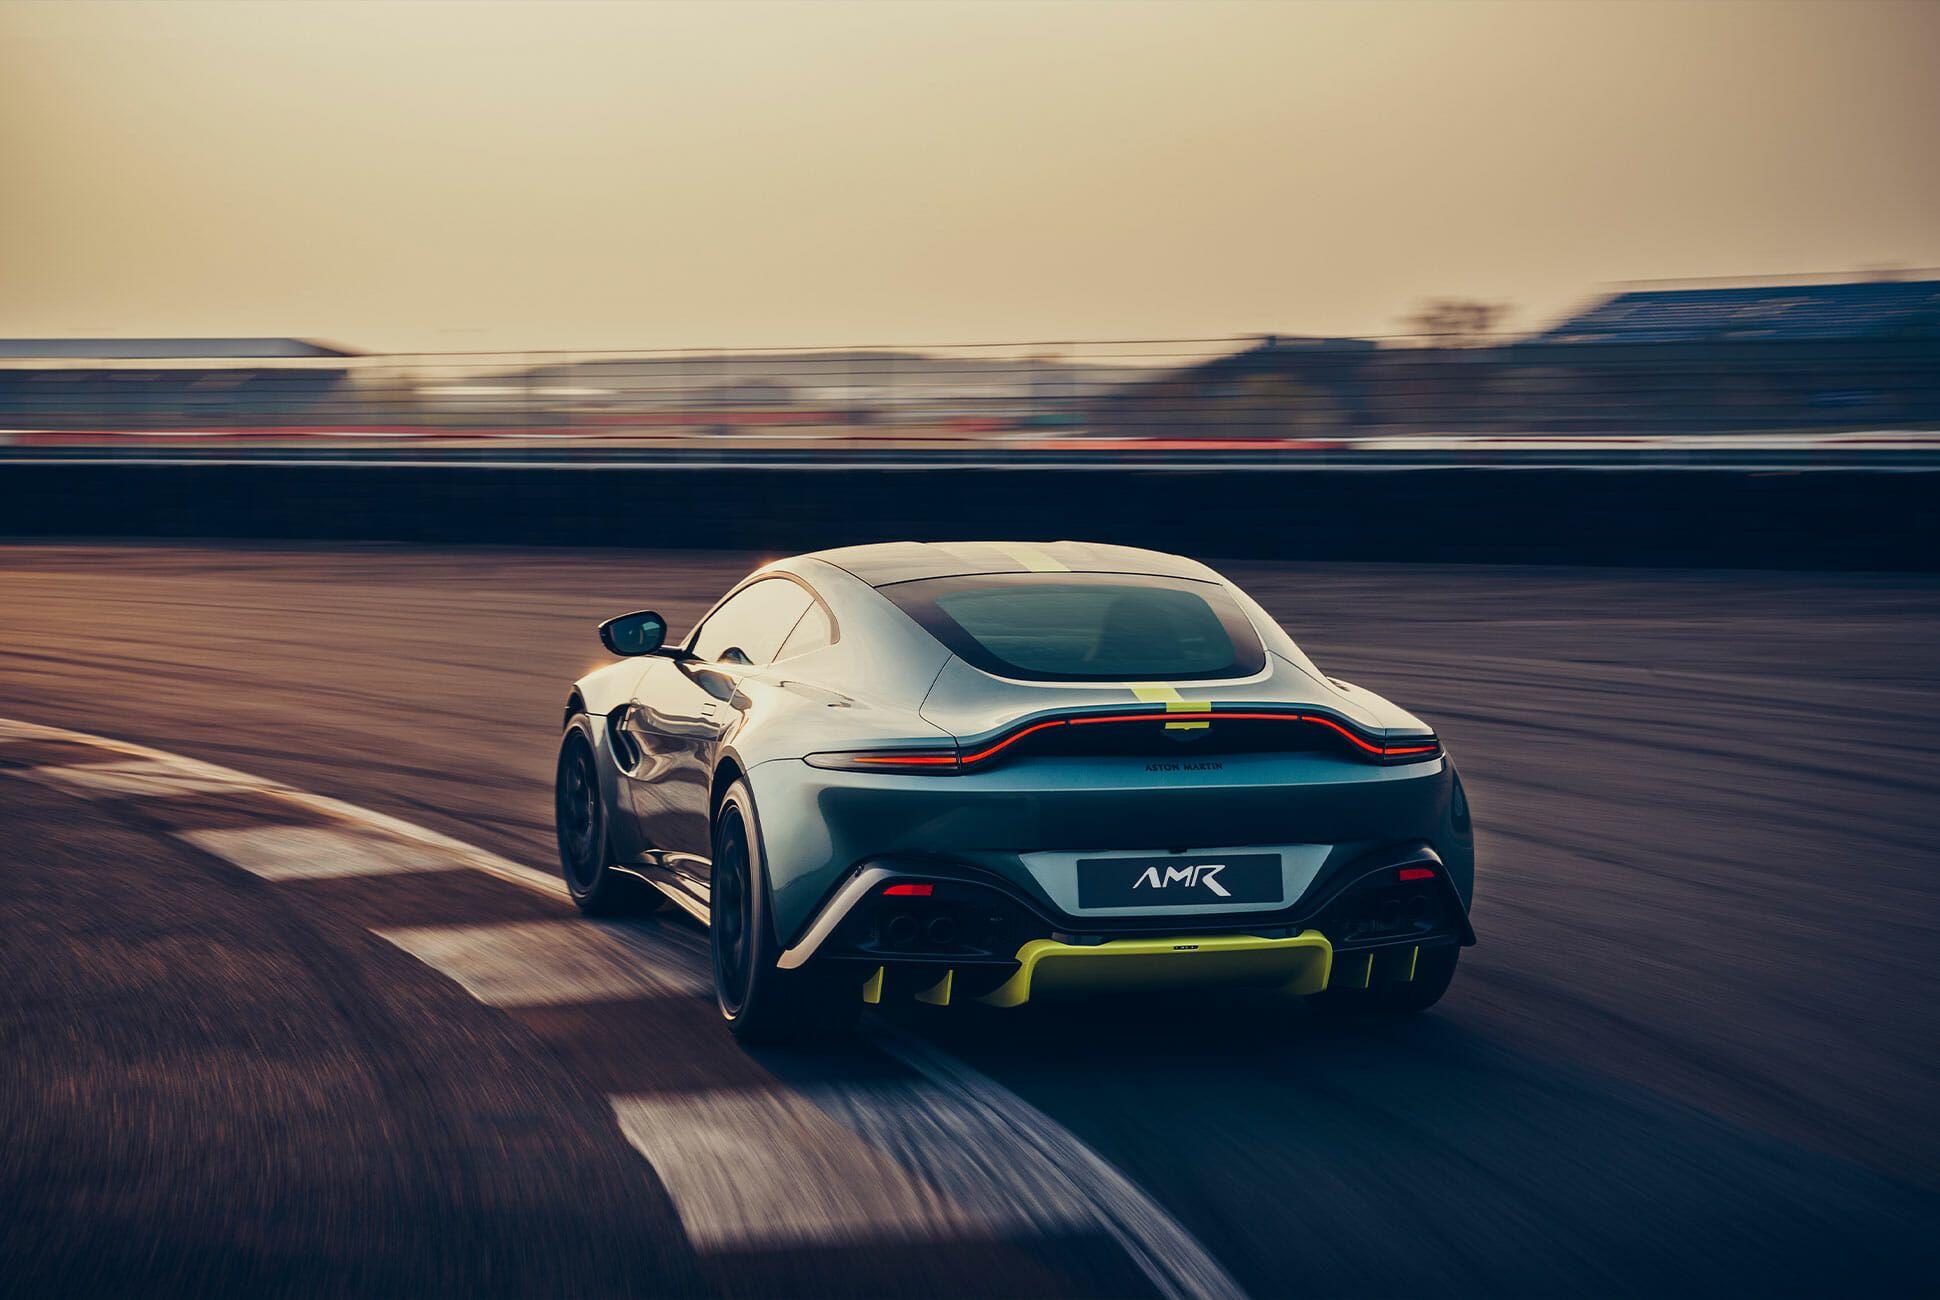 Aston-Martin-Vantage-AMR-Gear-Patrol-slide-3